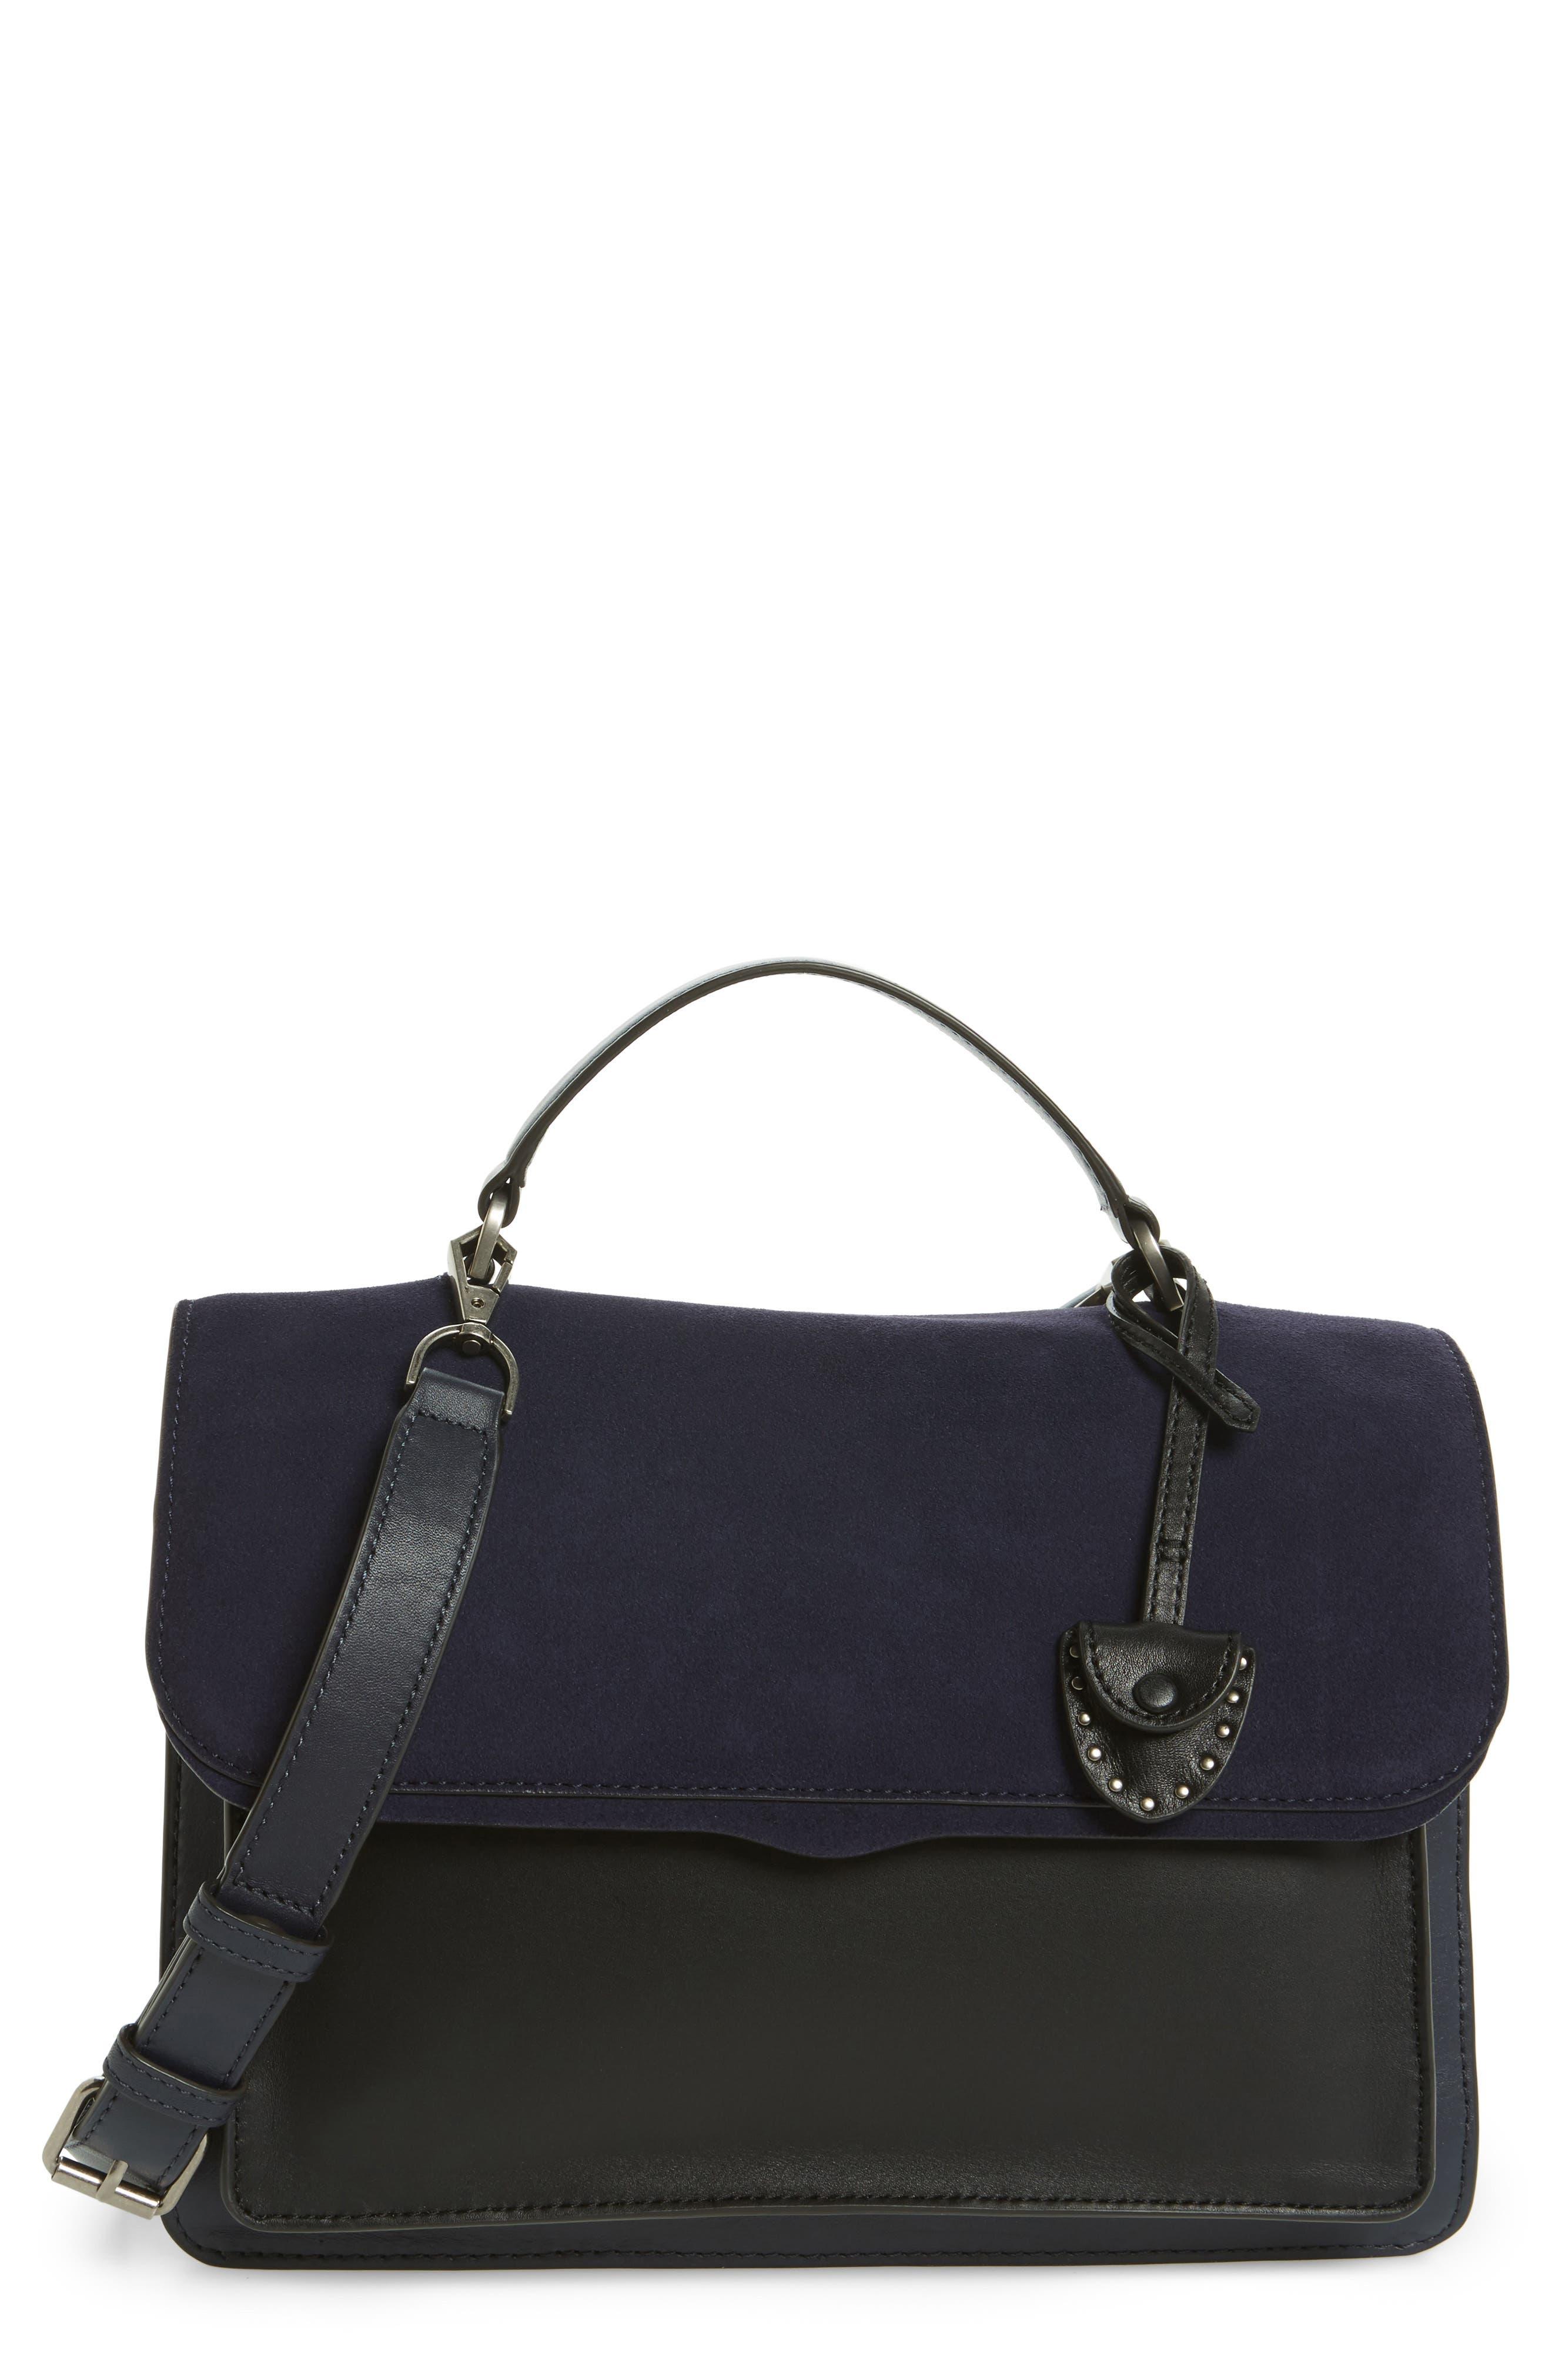 Top Handle Shoulder Bag,                         Main,                         color, Black